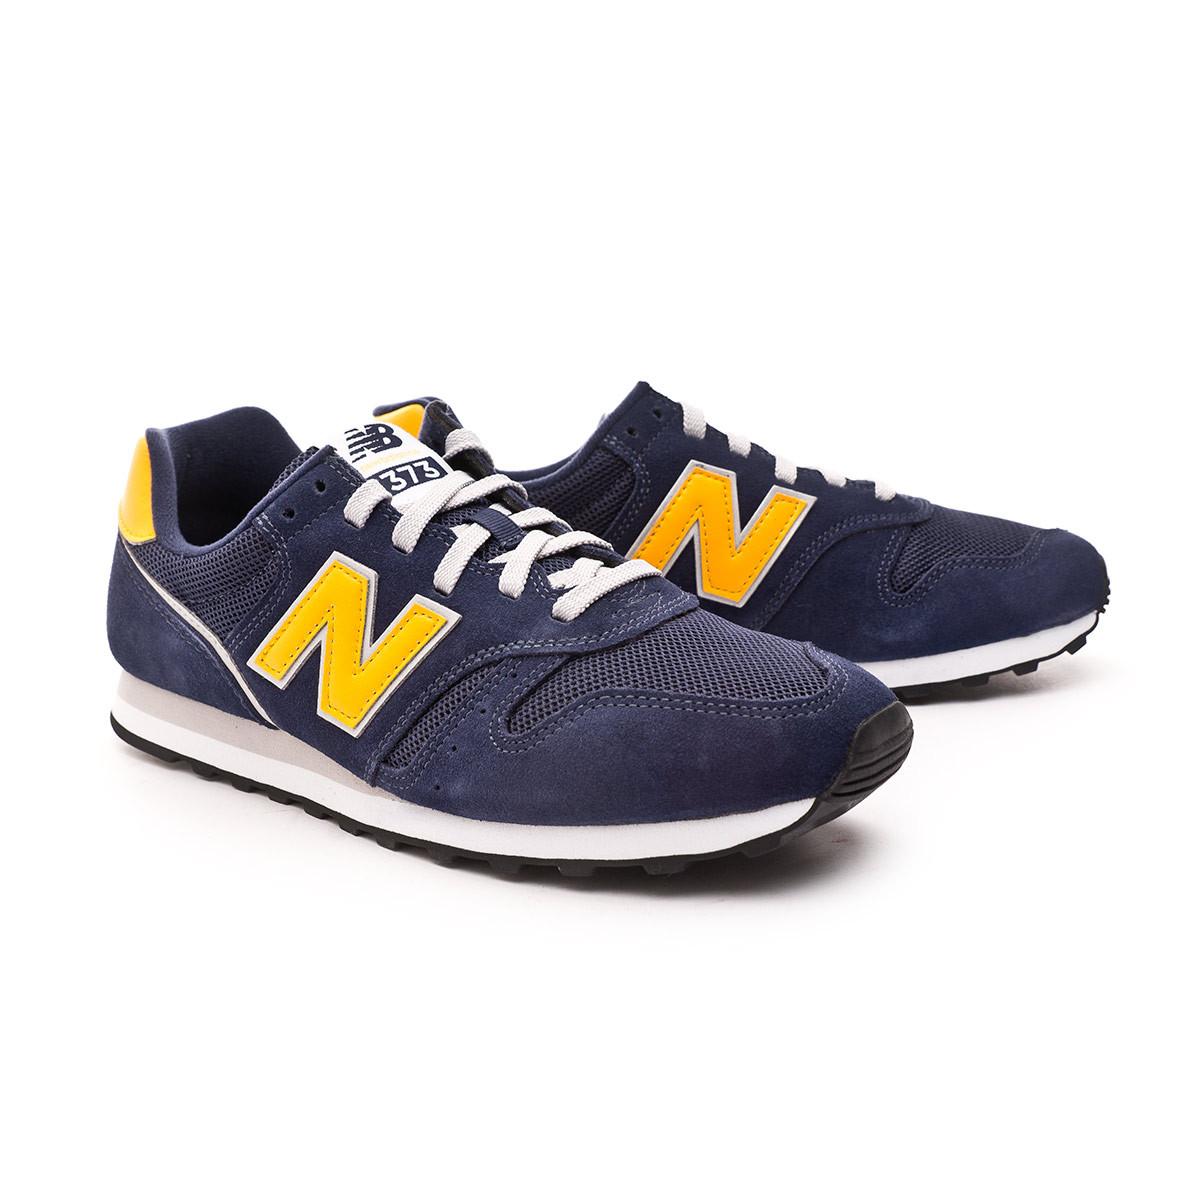 new balance 373 navy